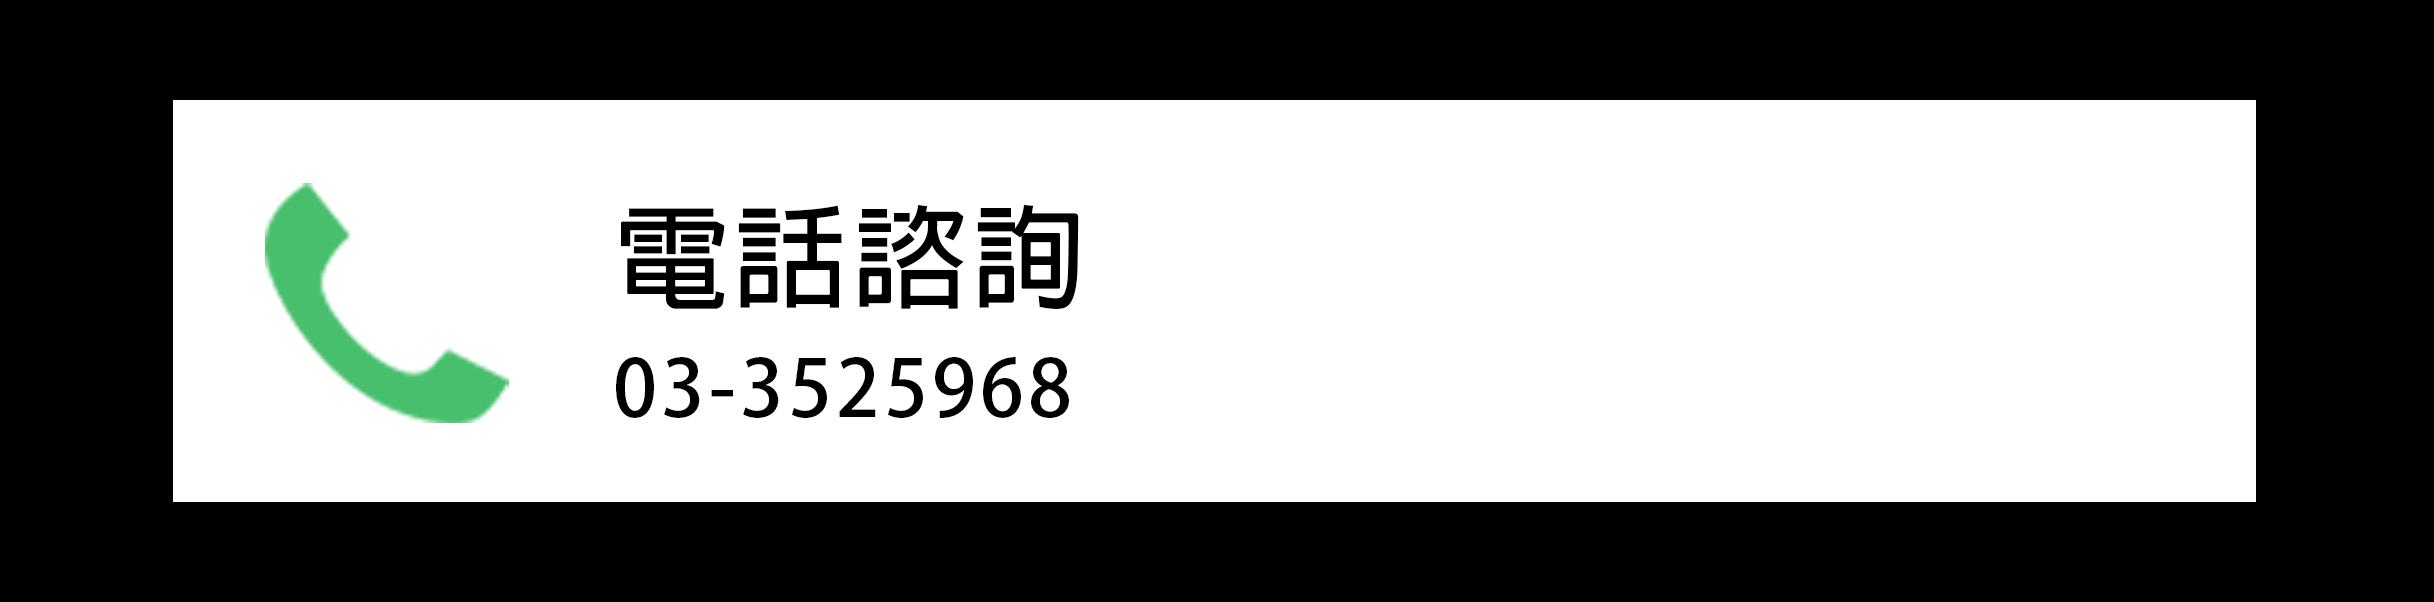 033525968